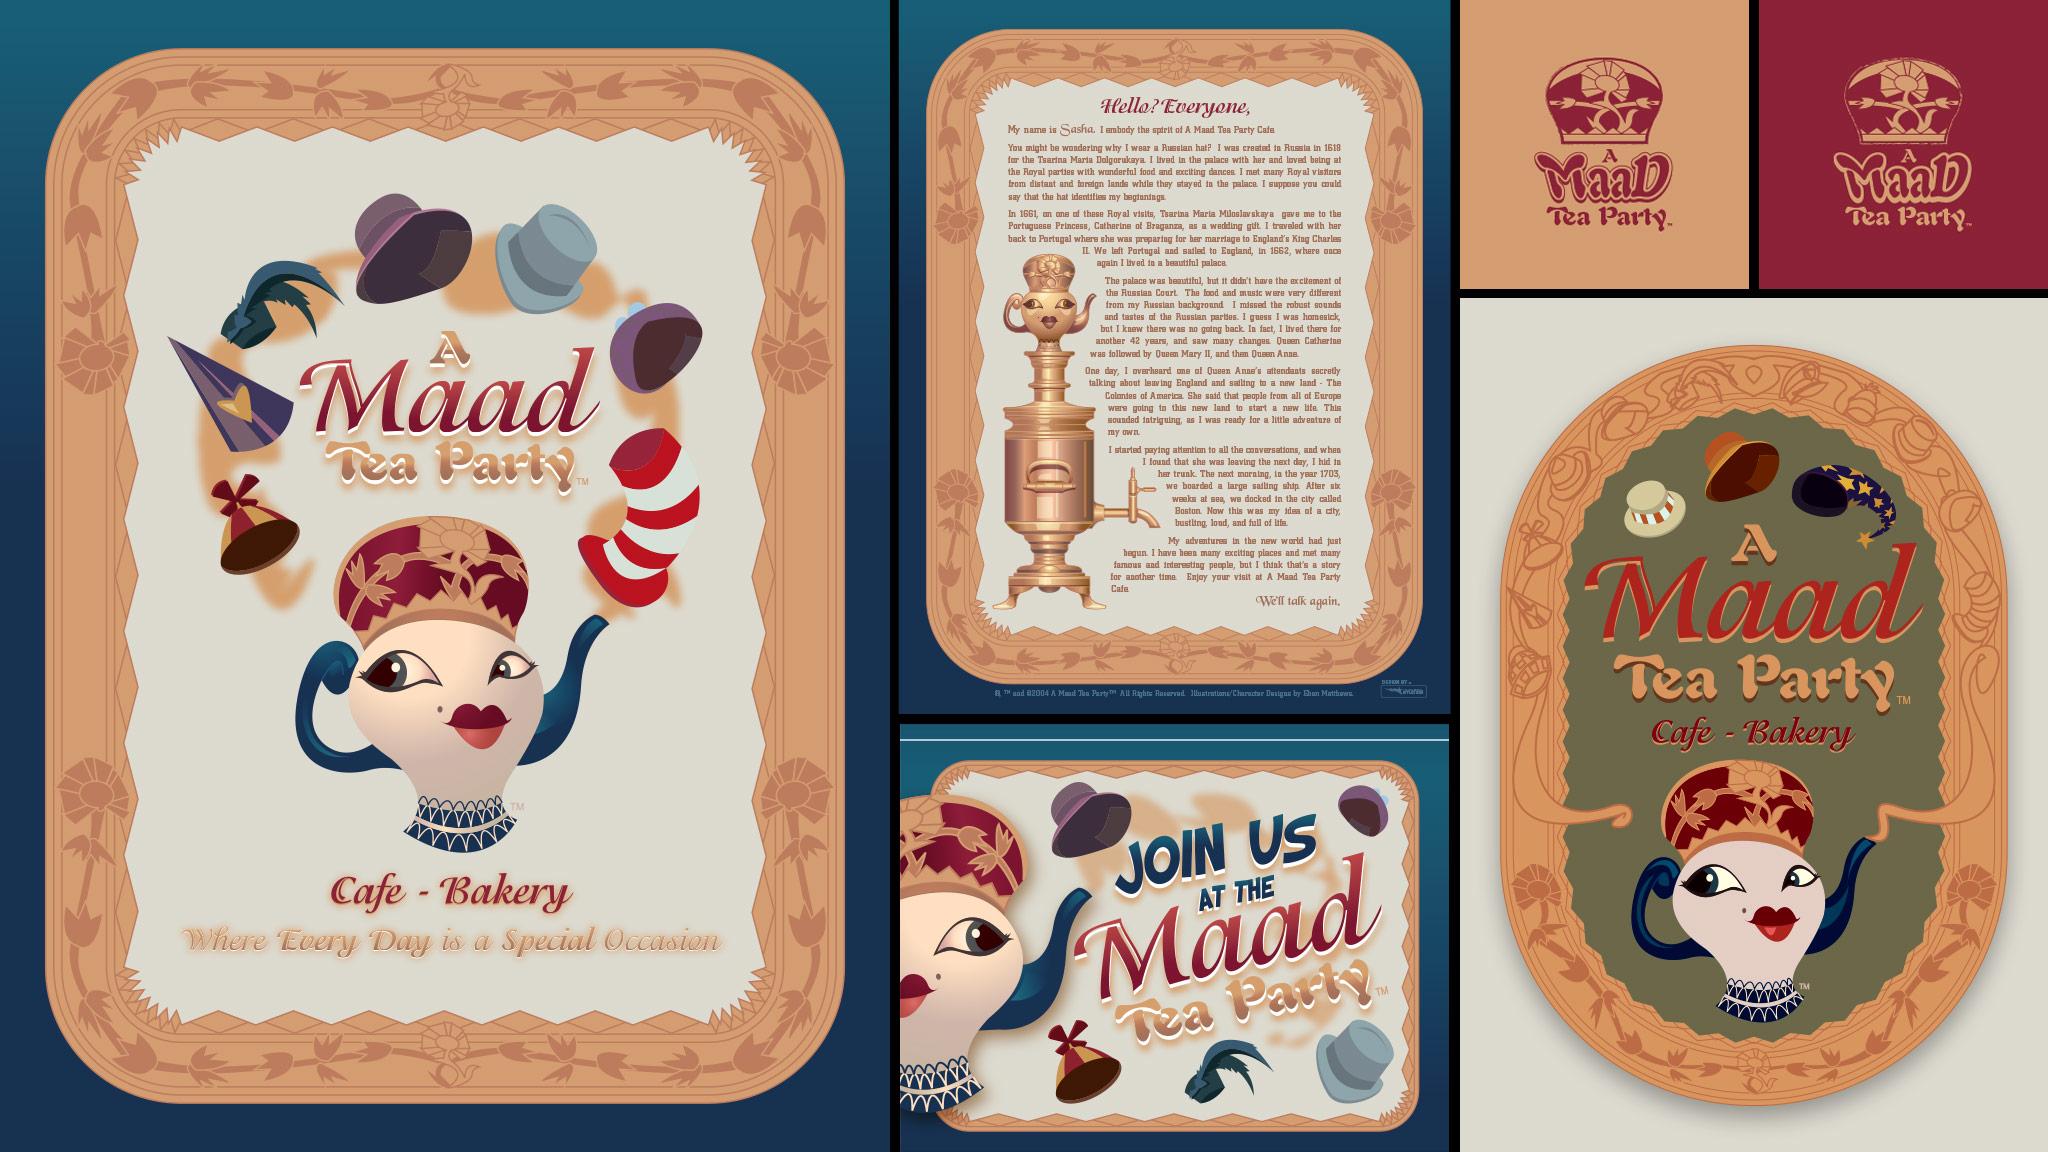 Design_Branding_MaadTeaParty.jpg